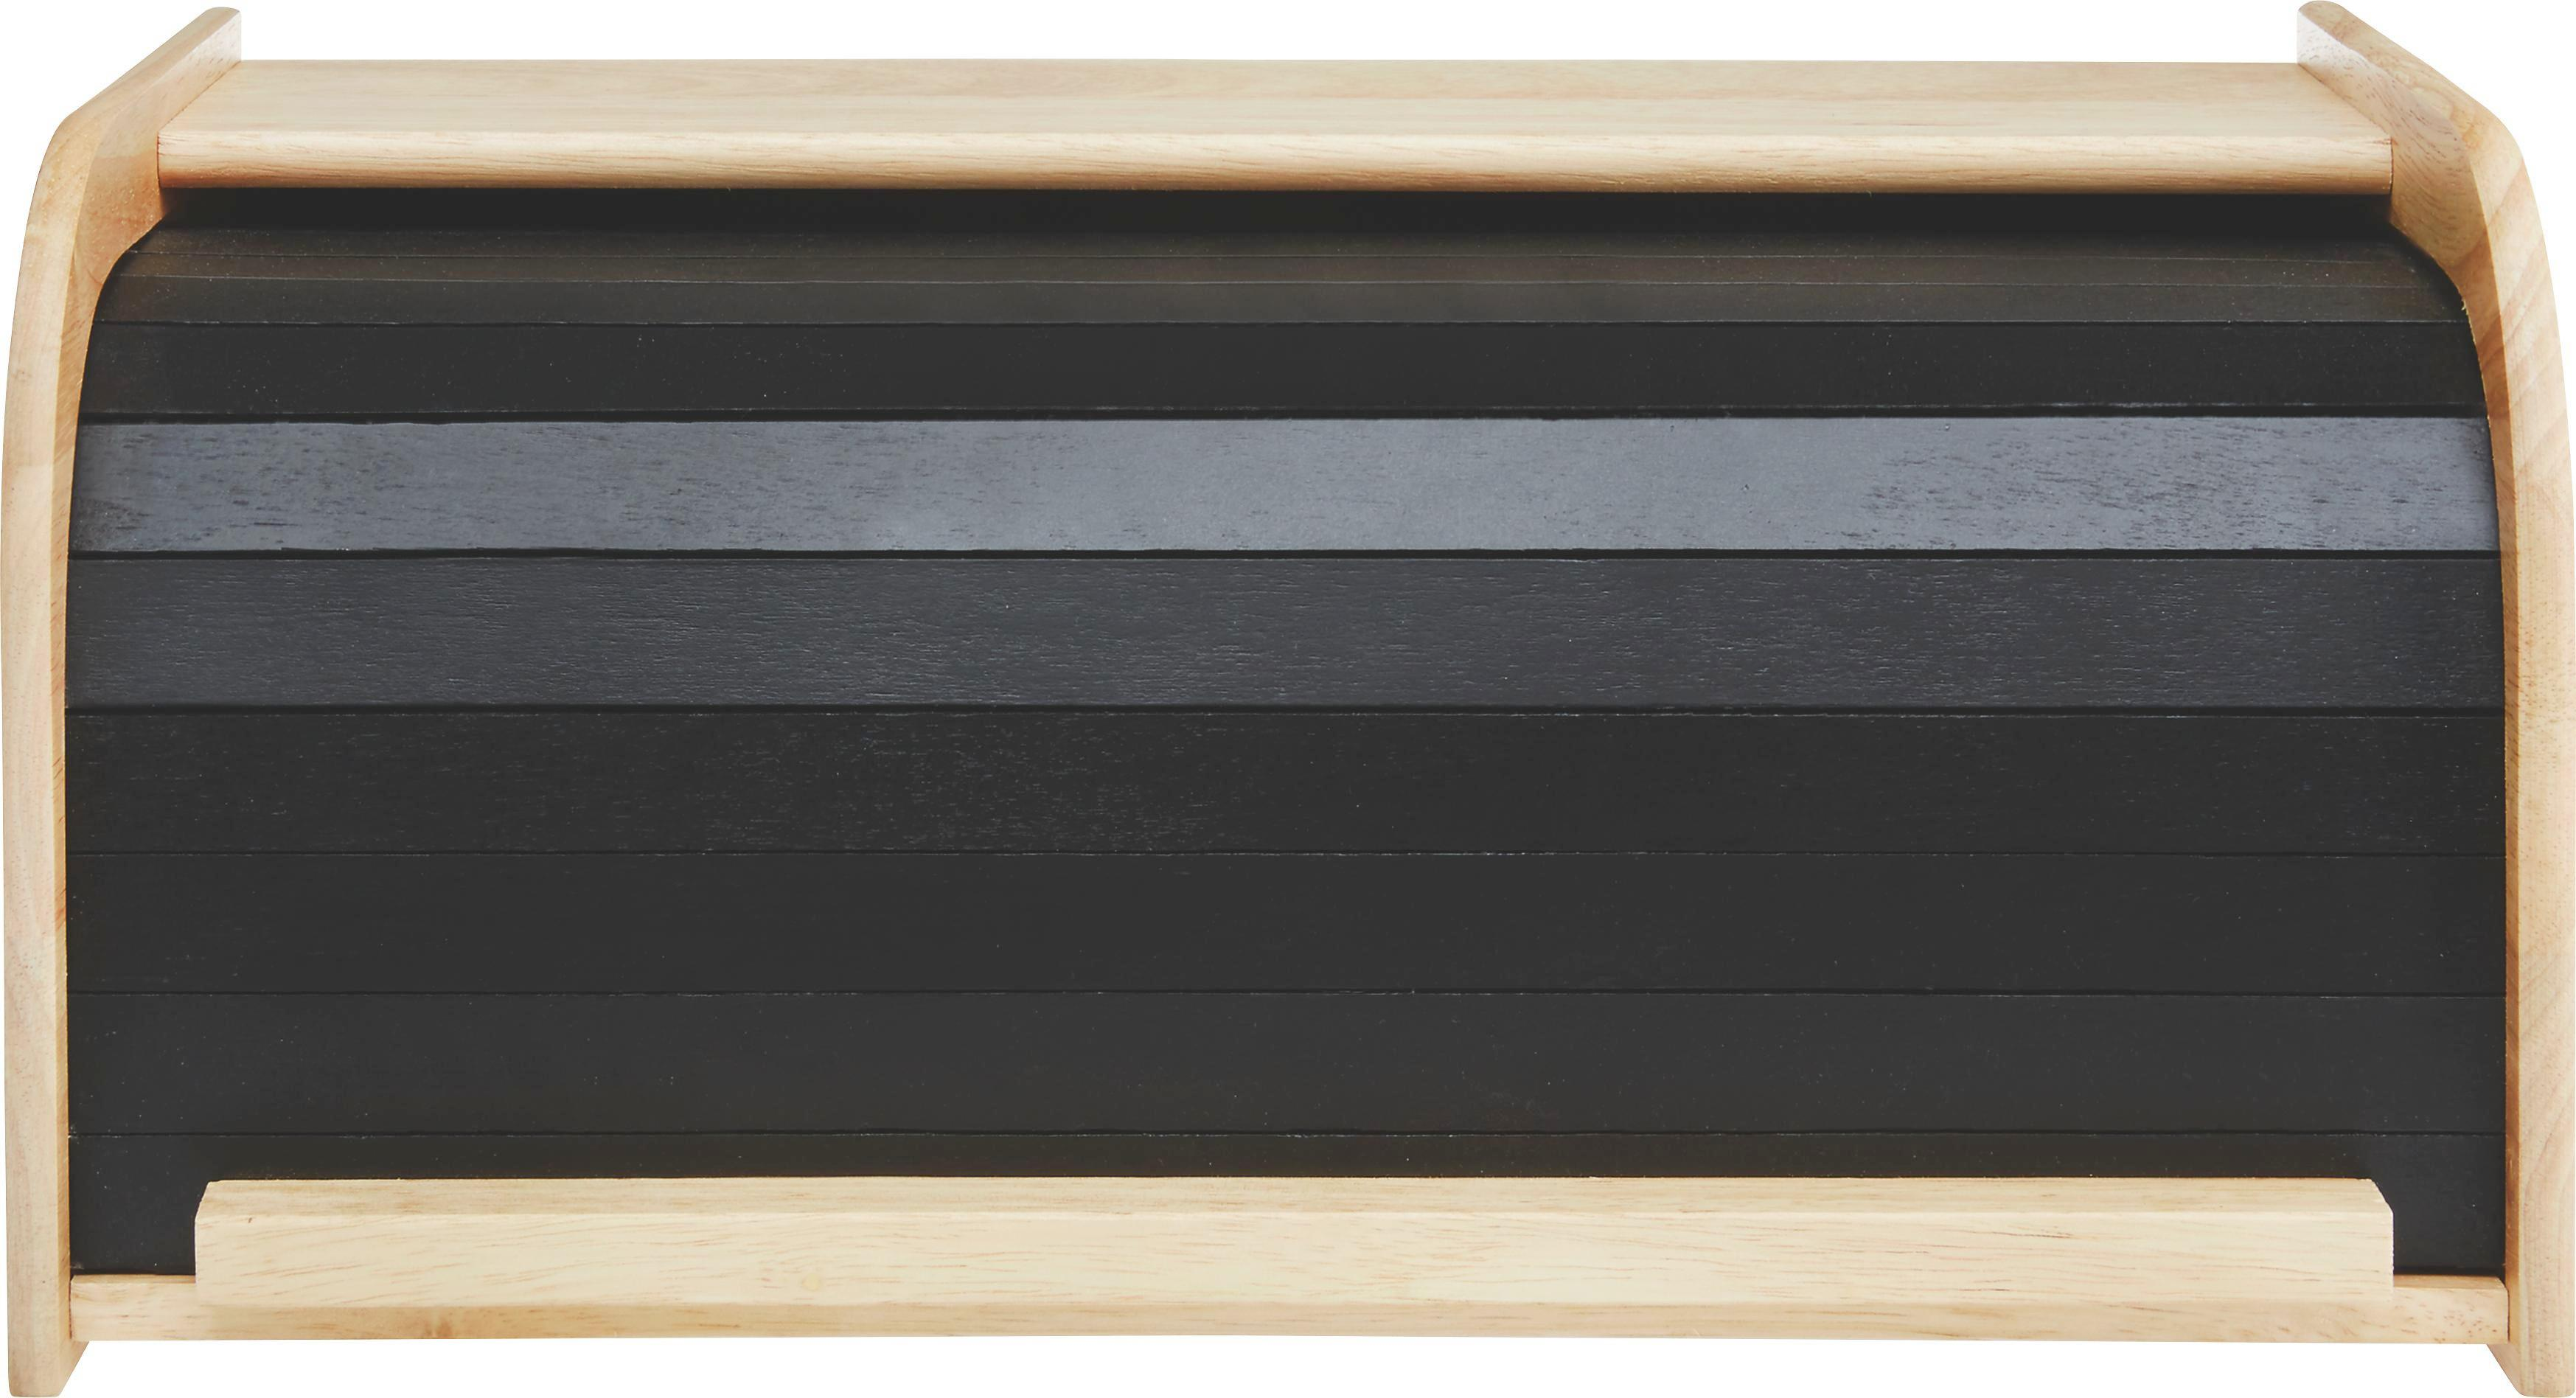 Brotbox Sirikit in Natur/Schwarz - Schwarz/Naturfarben, LIFESTYLE, Holz (40/23/19,5cm) - MÖMAX modern living